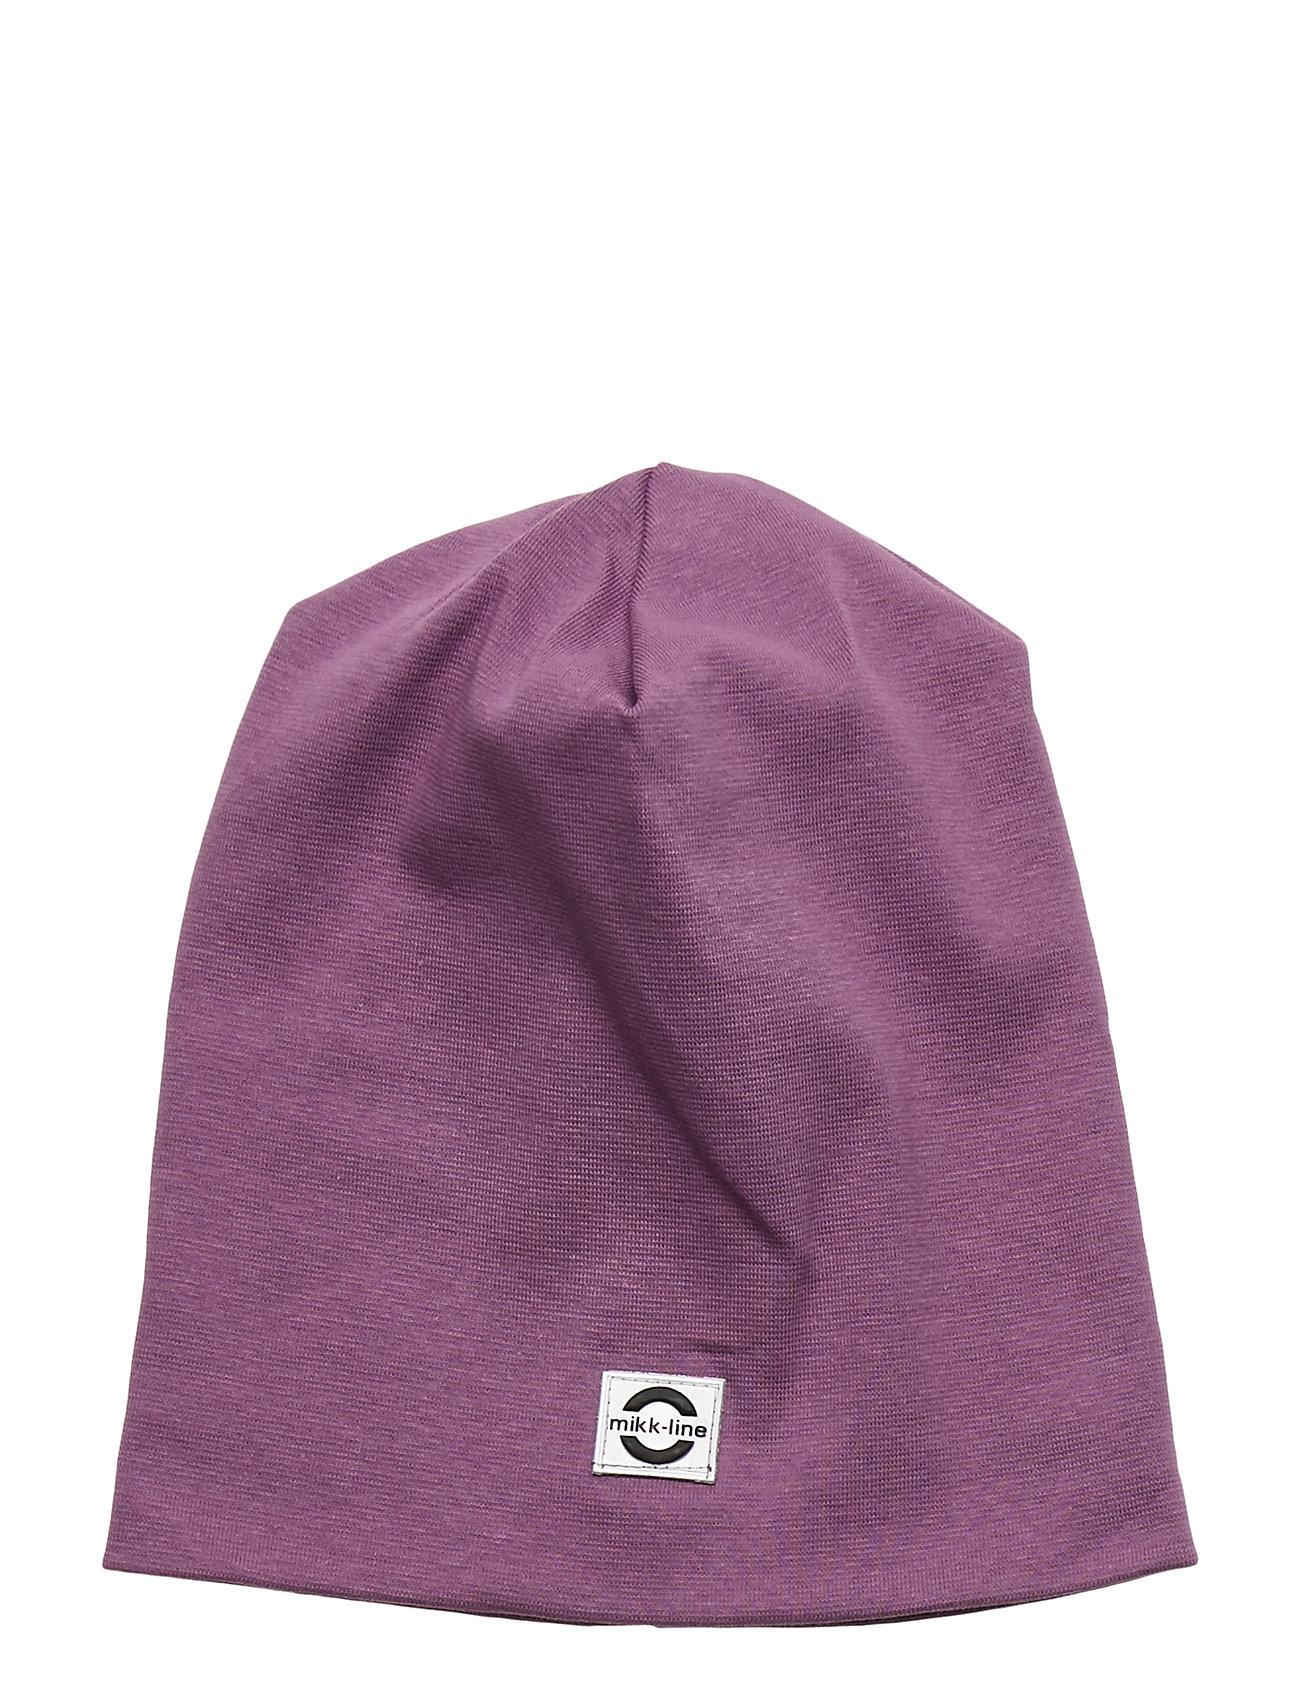 Image of Cotton Hat - Solid Accessories Headwear Hats Lilla Mikk-Line (3406311245)